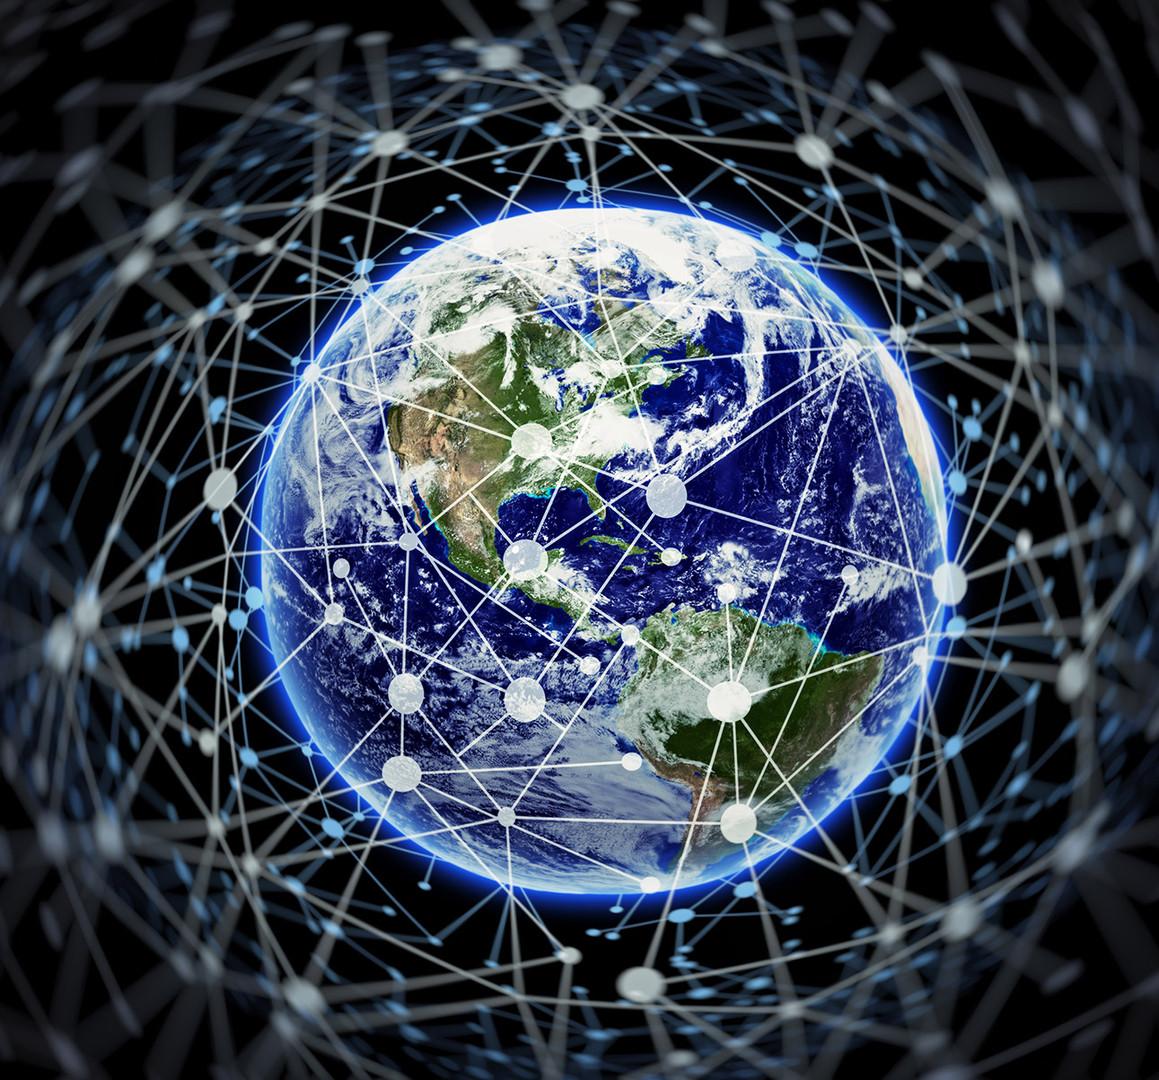 Netzwerk Blockchain Erde 2 19.jpg